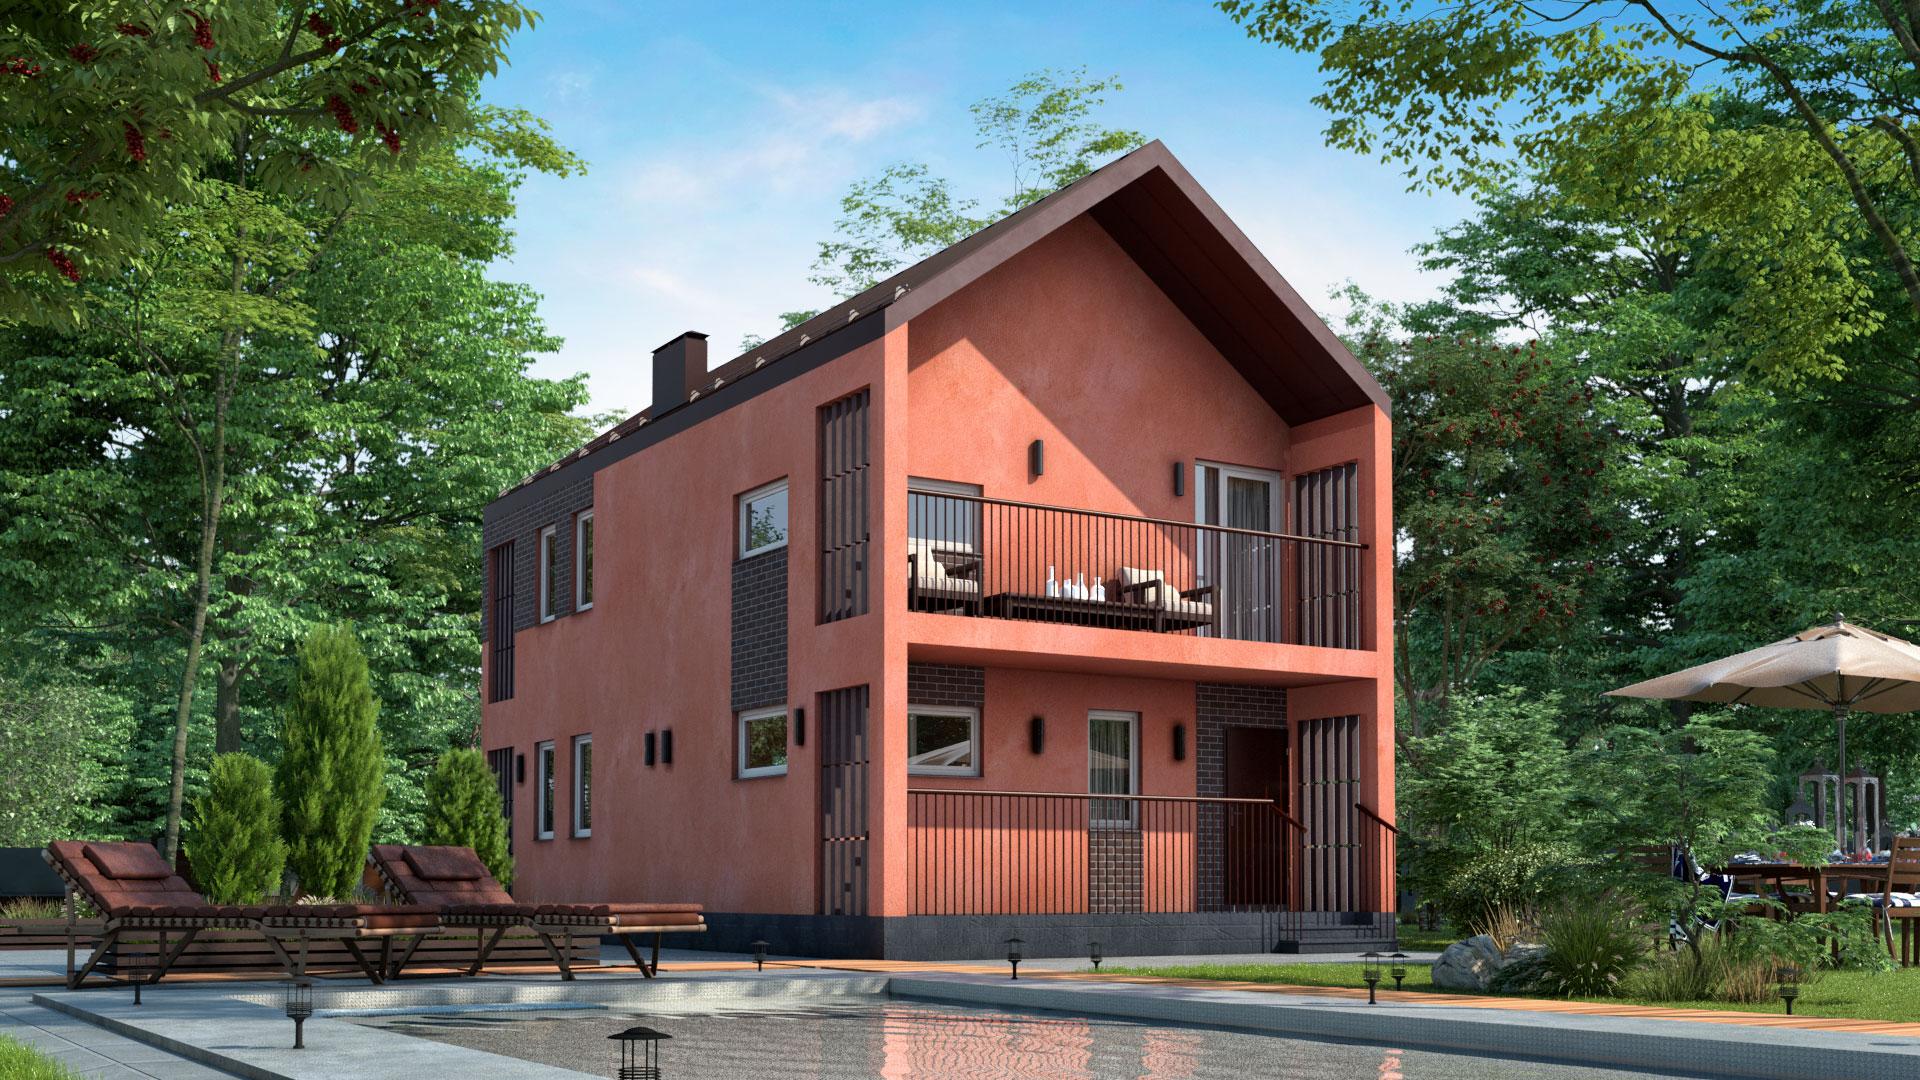 Задний фасад двухэтажного дома БЭНПАН, проект МС-144.